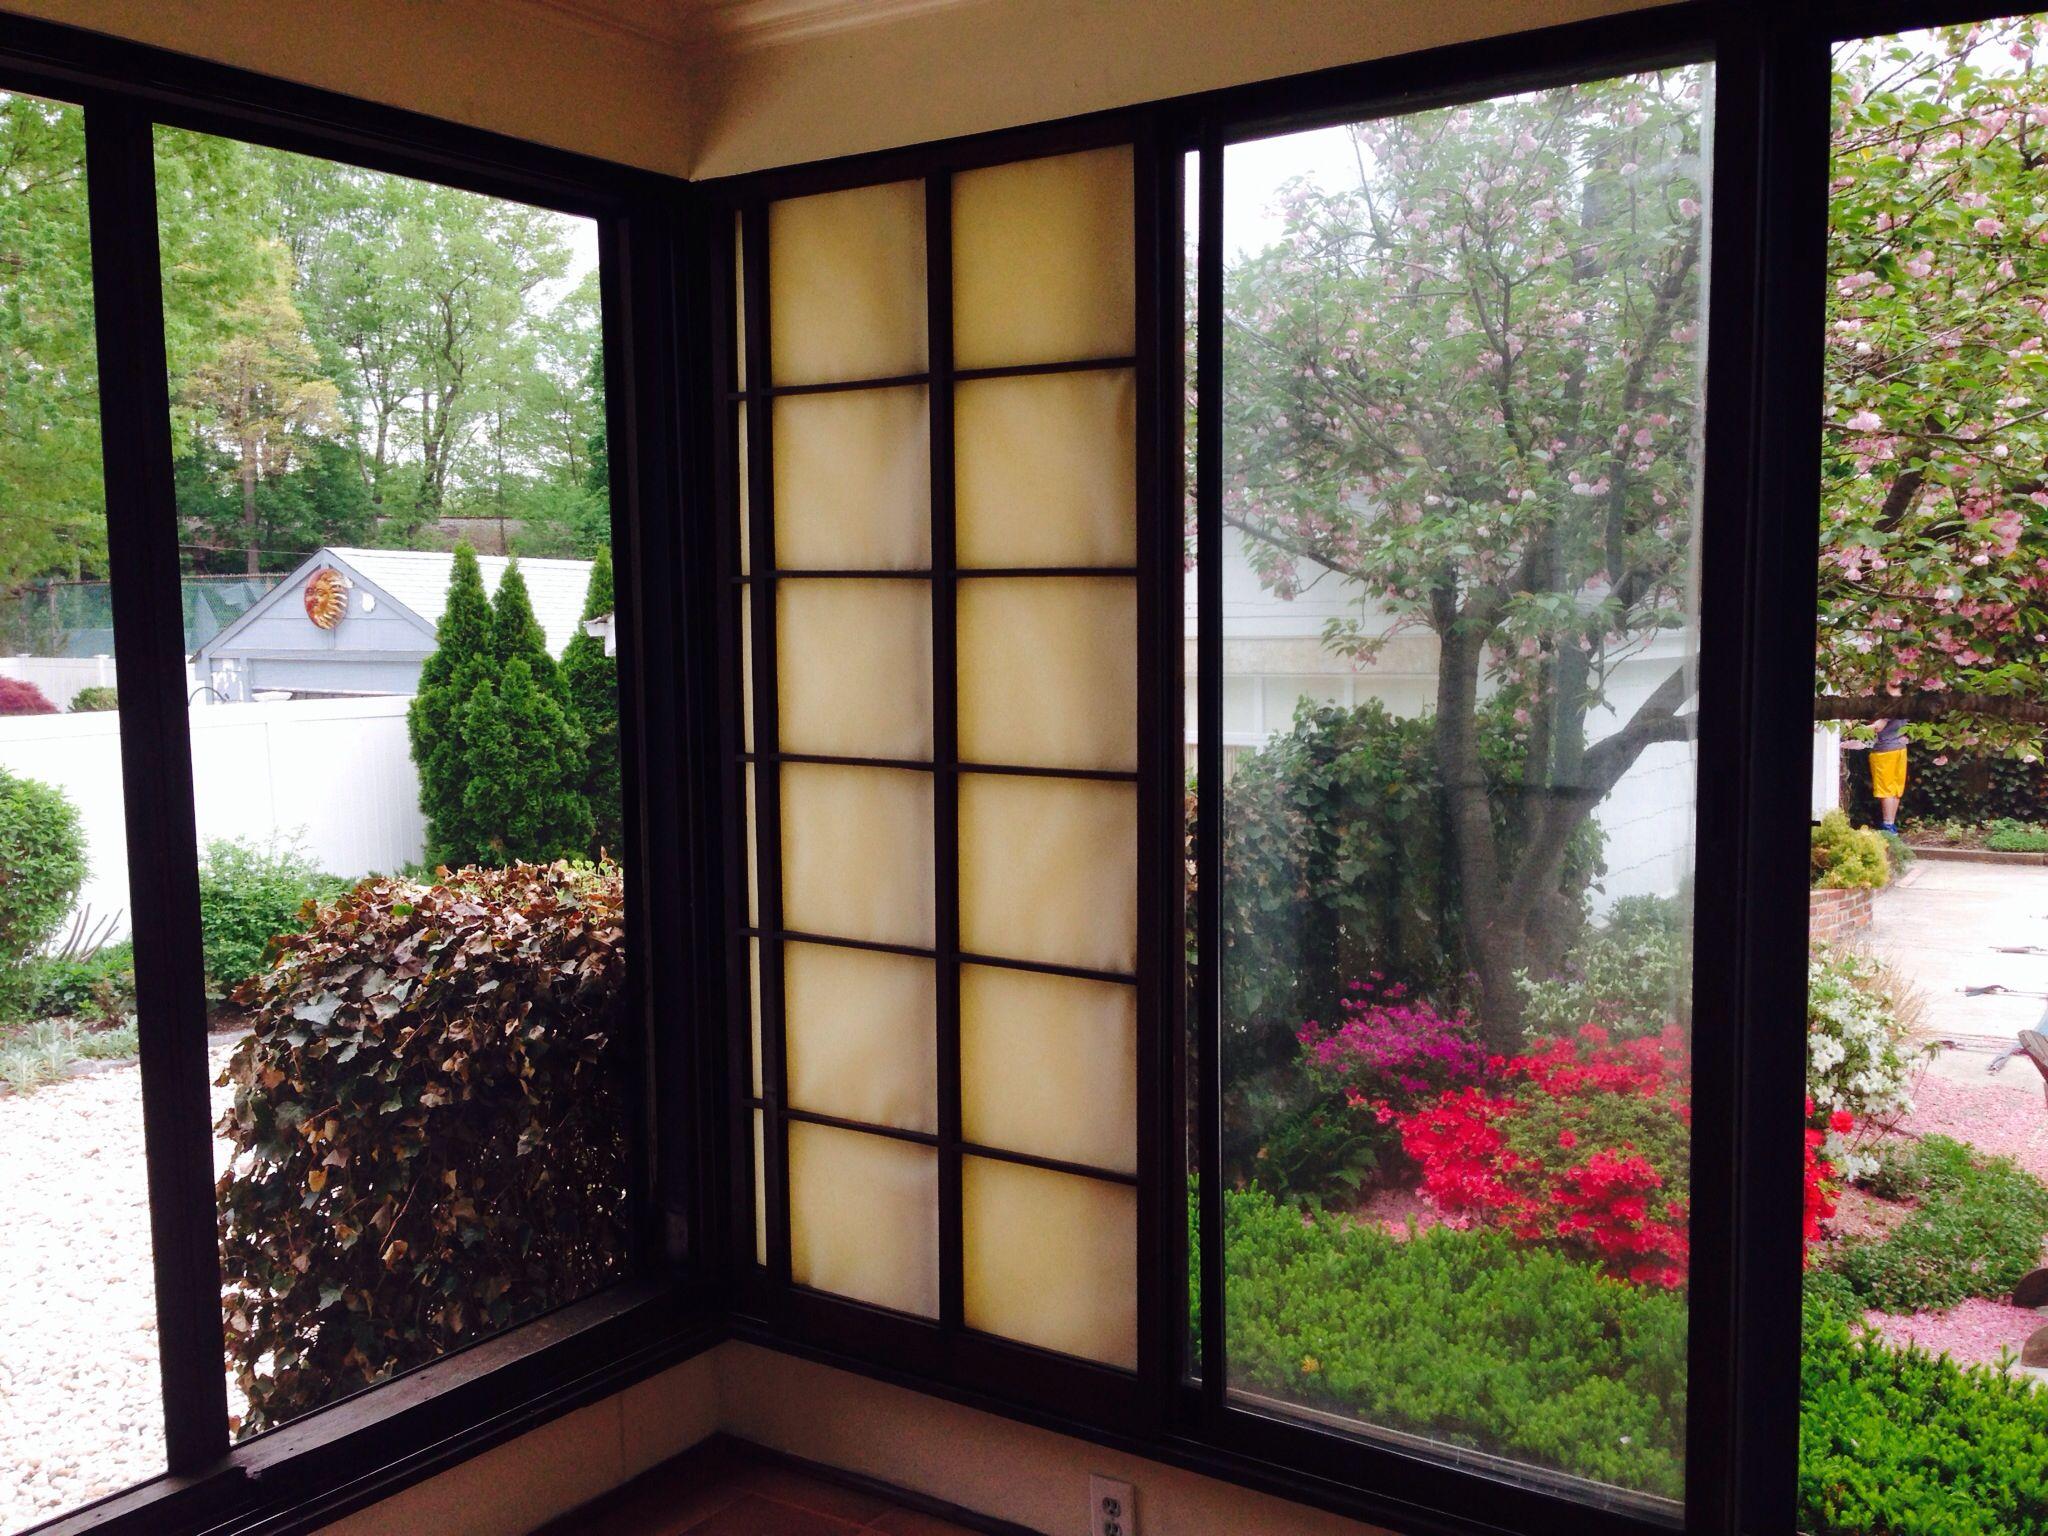 Shoji screens on back porch / sliders